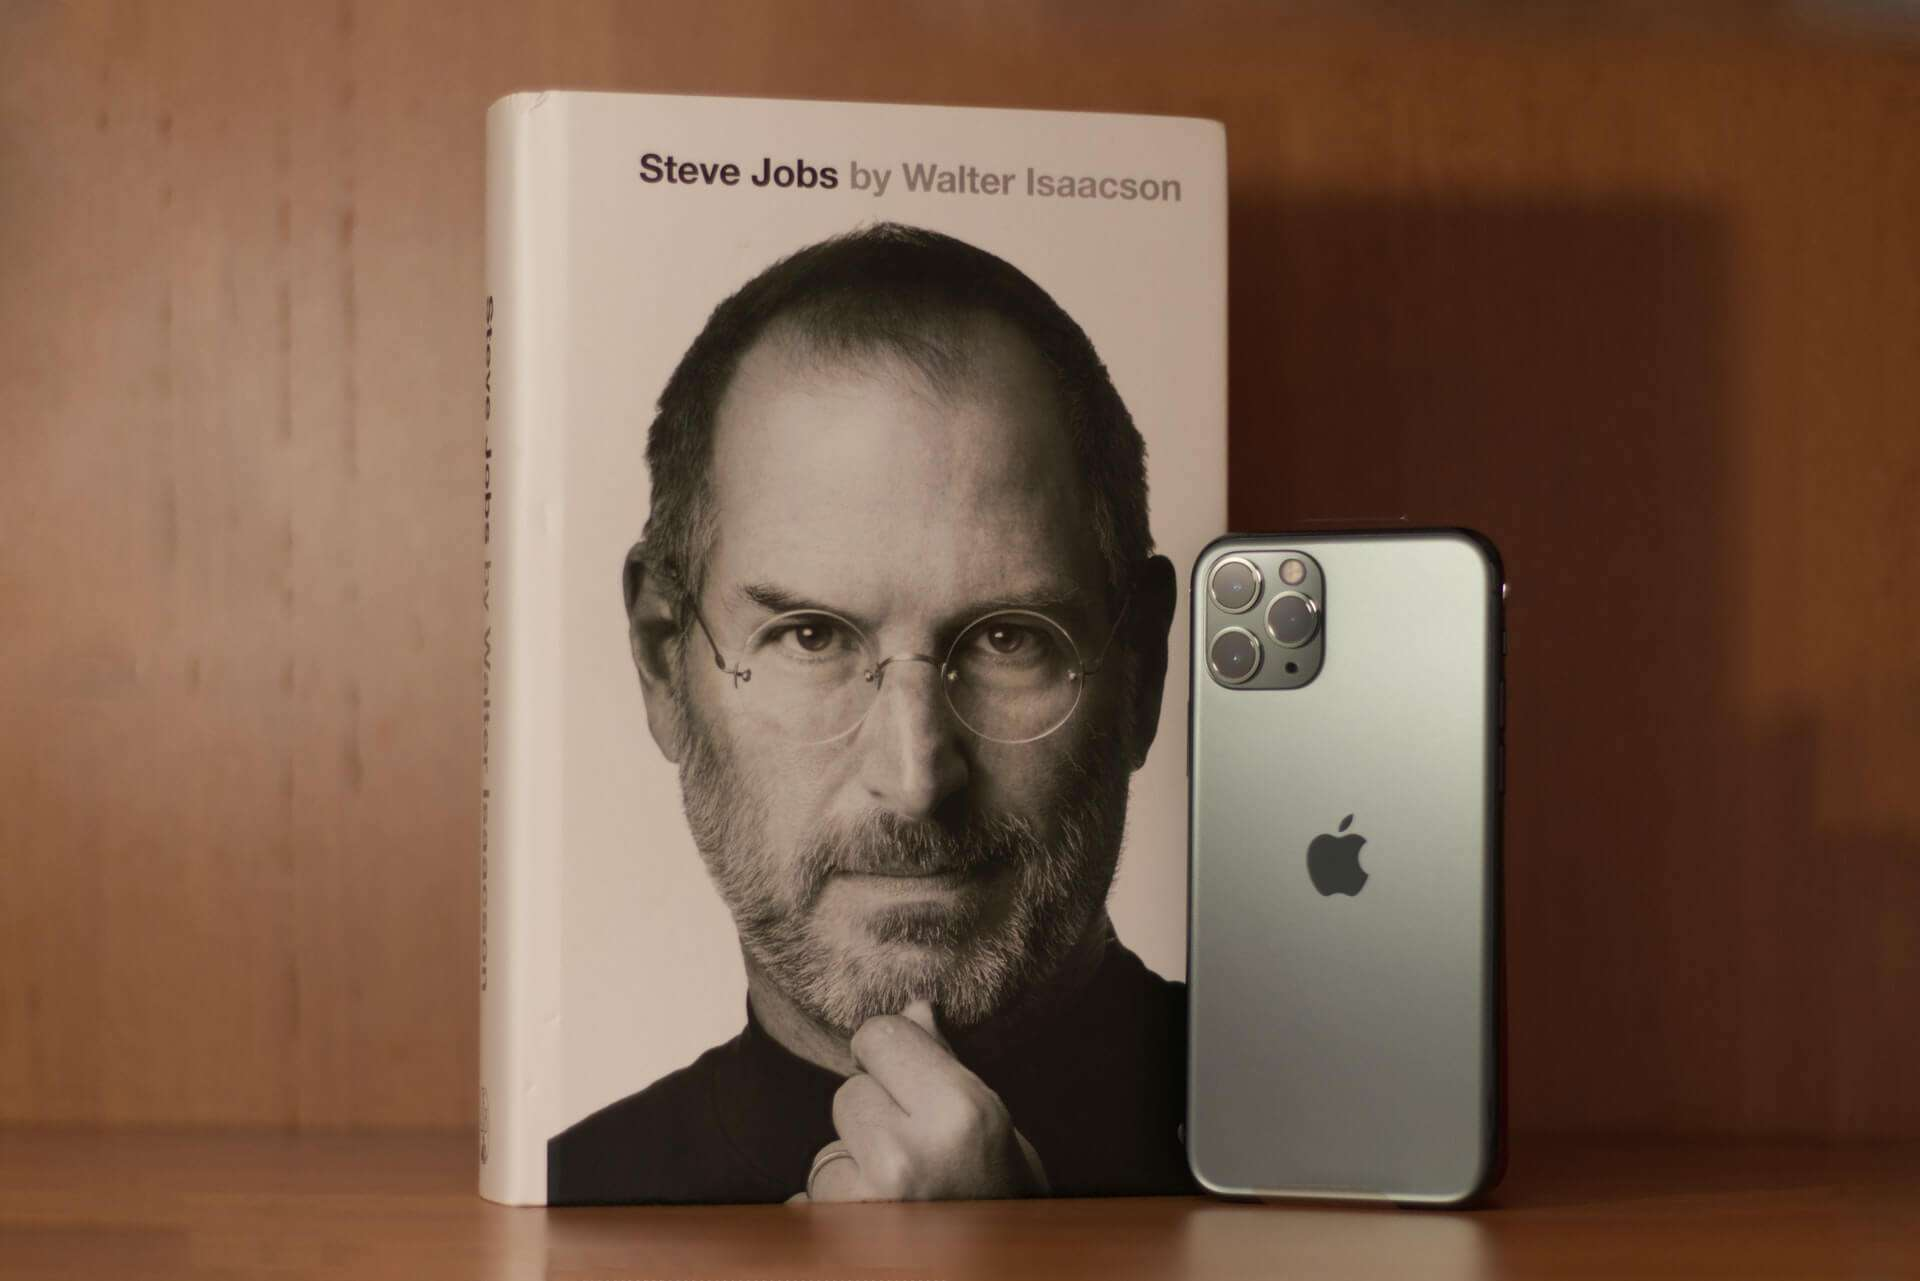 Steve Jobs born on this week in 1955